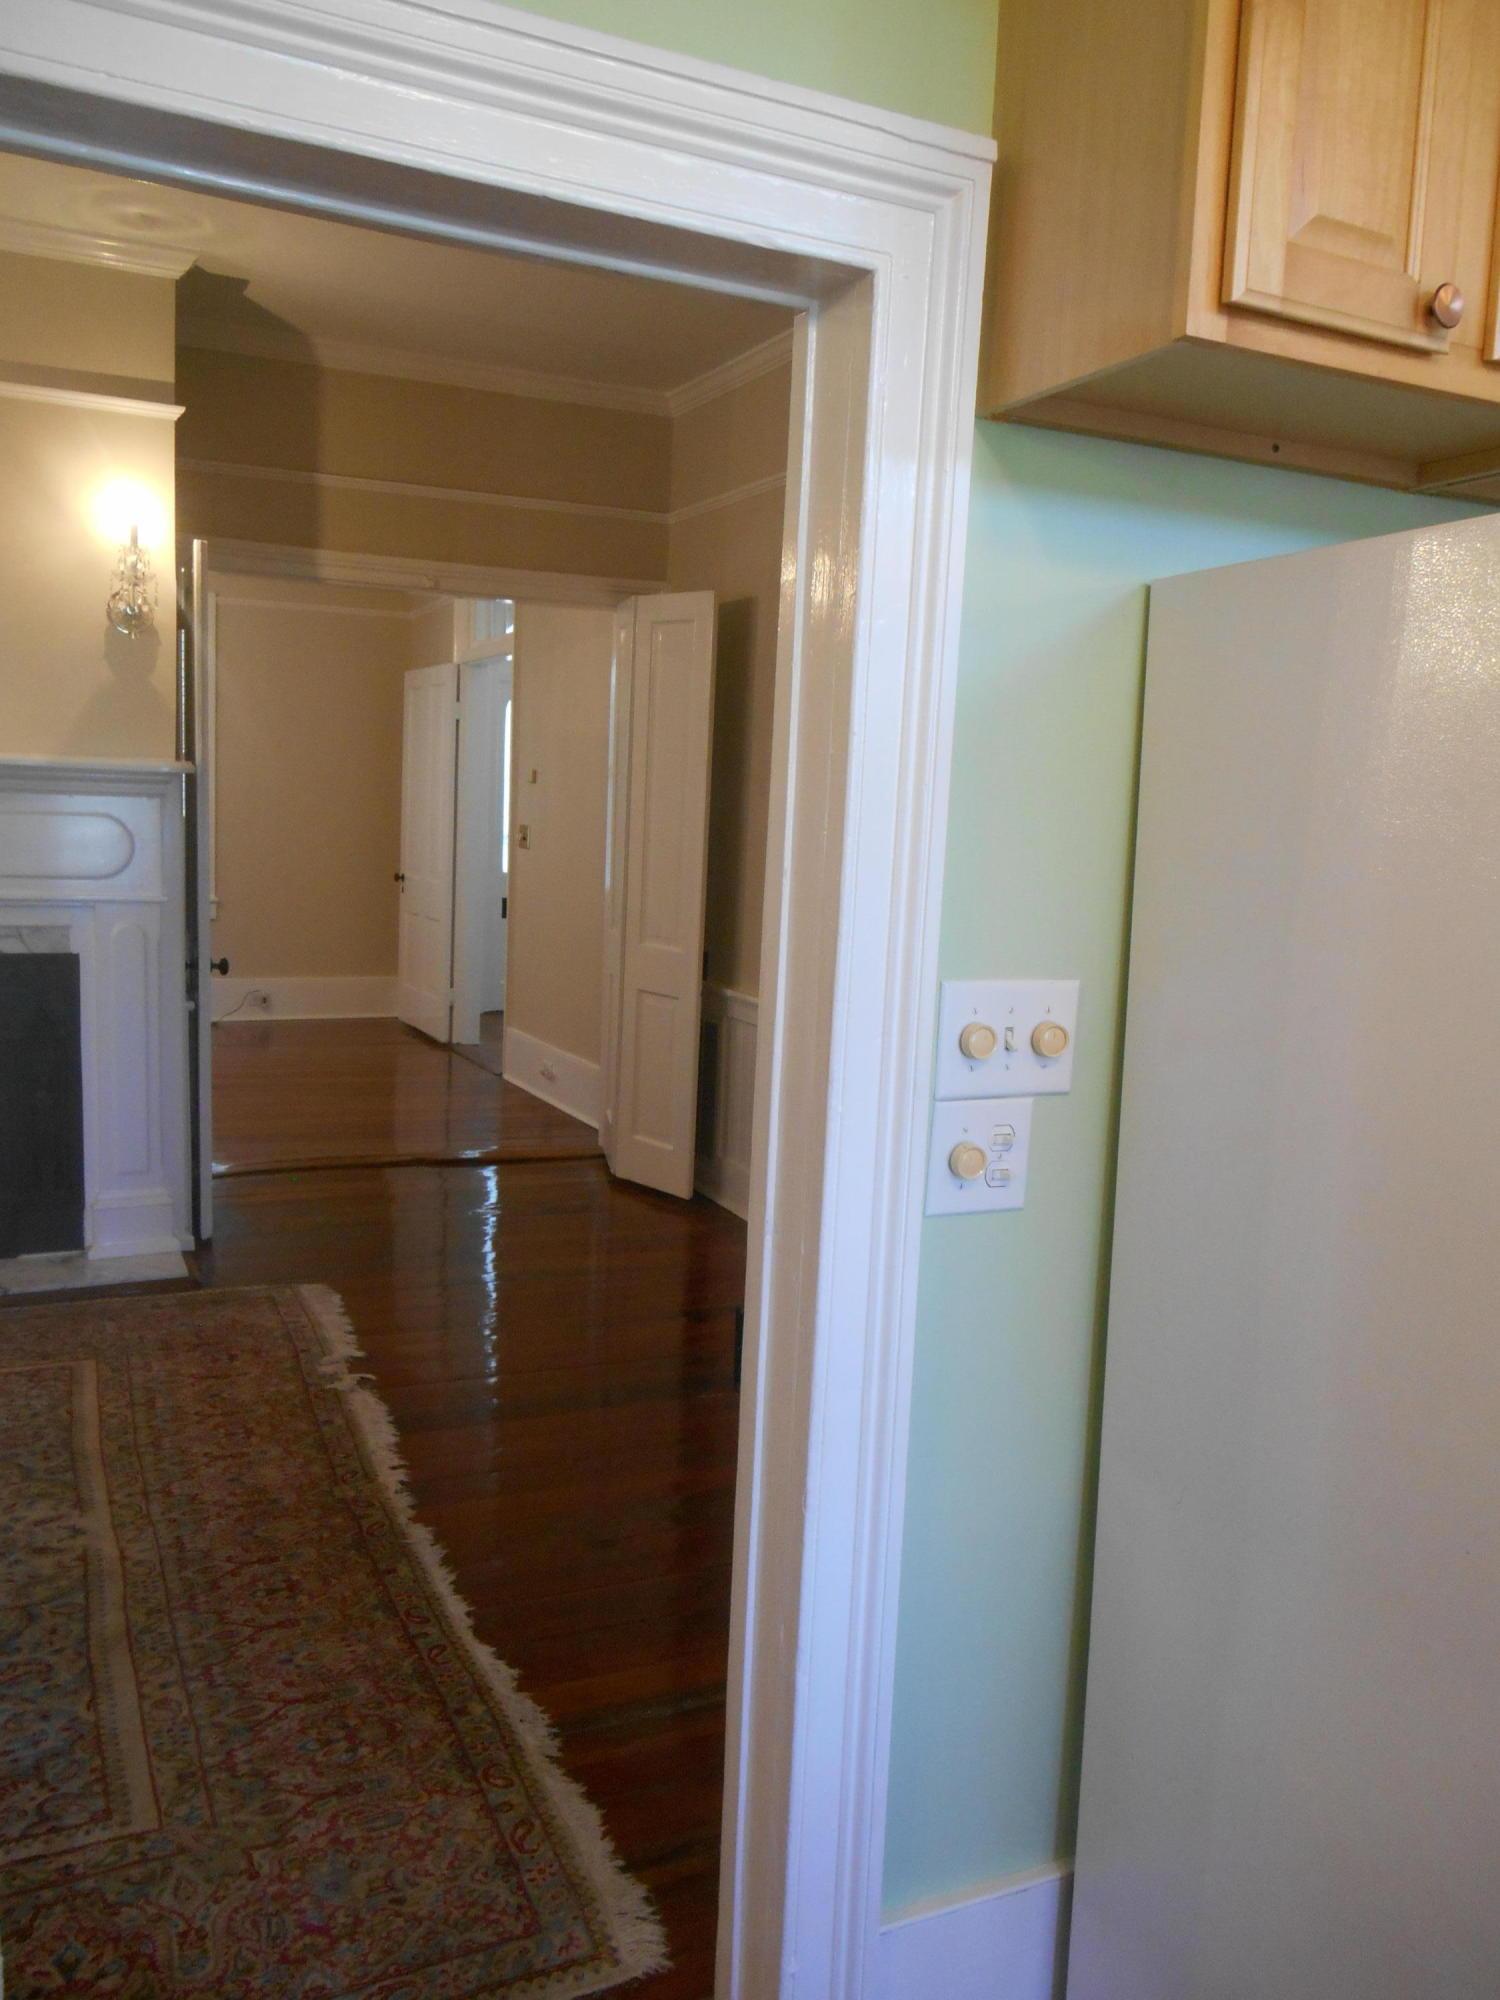 Historic District Homes For Sale - 516 Central, Summerville, SC - 23